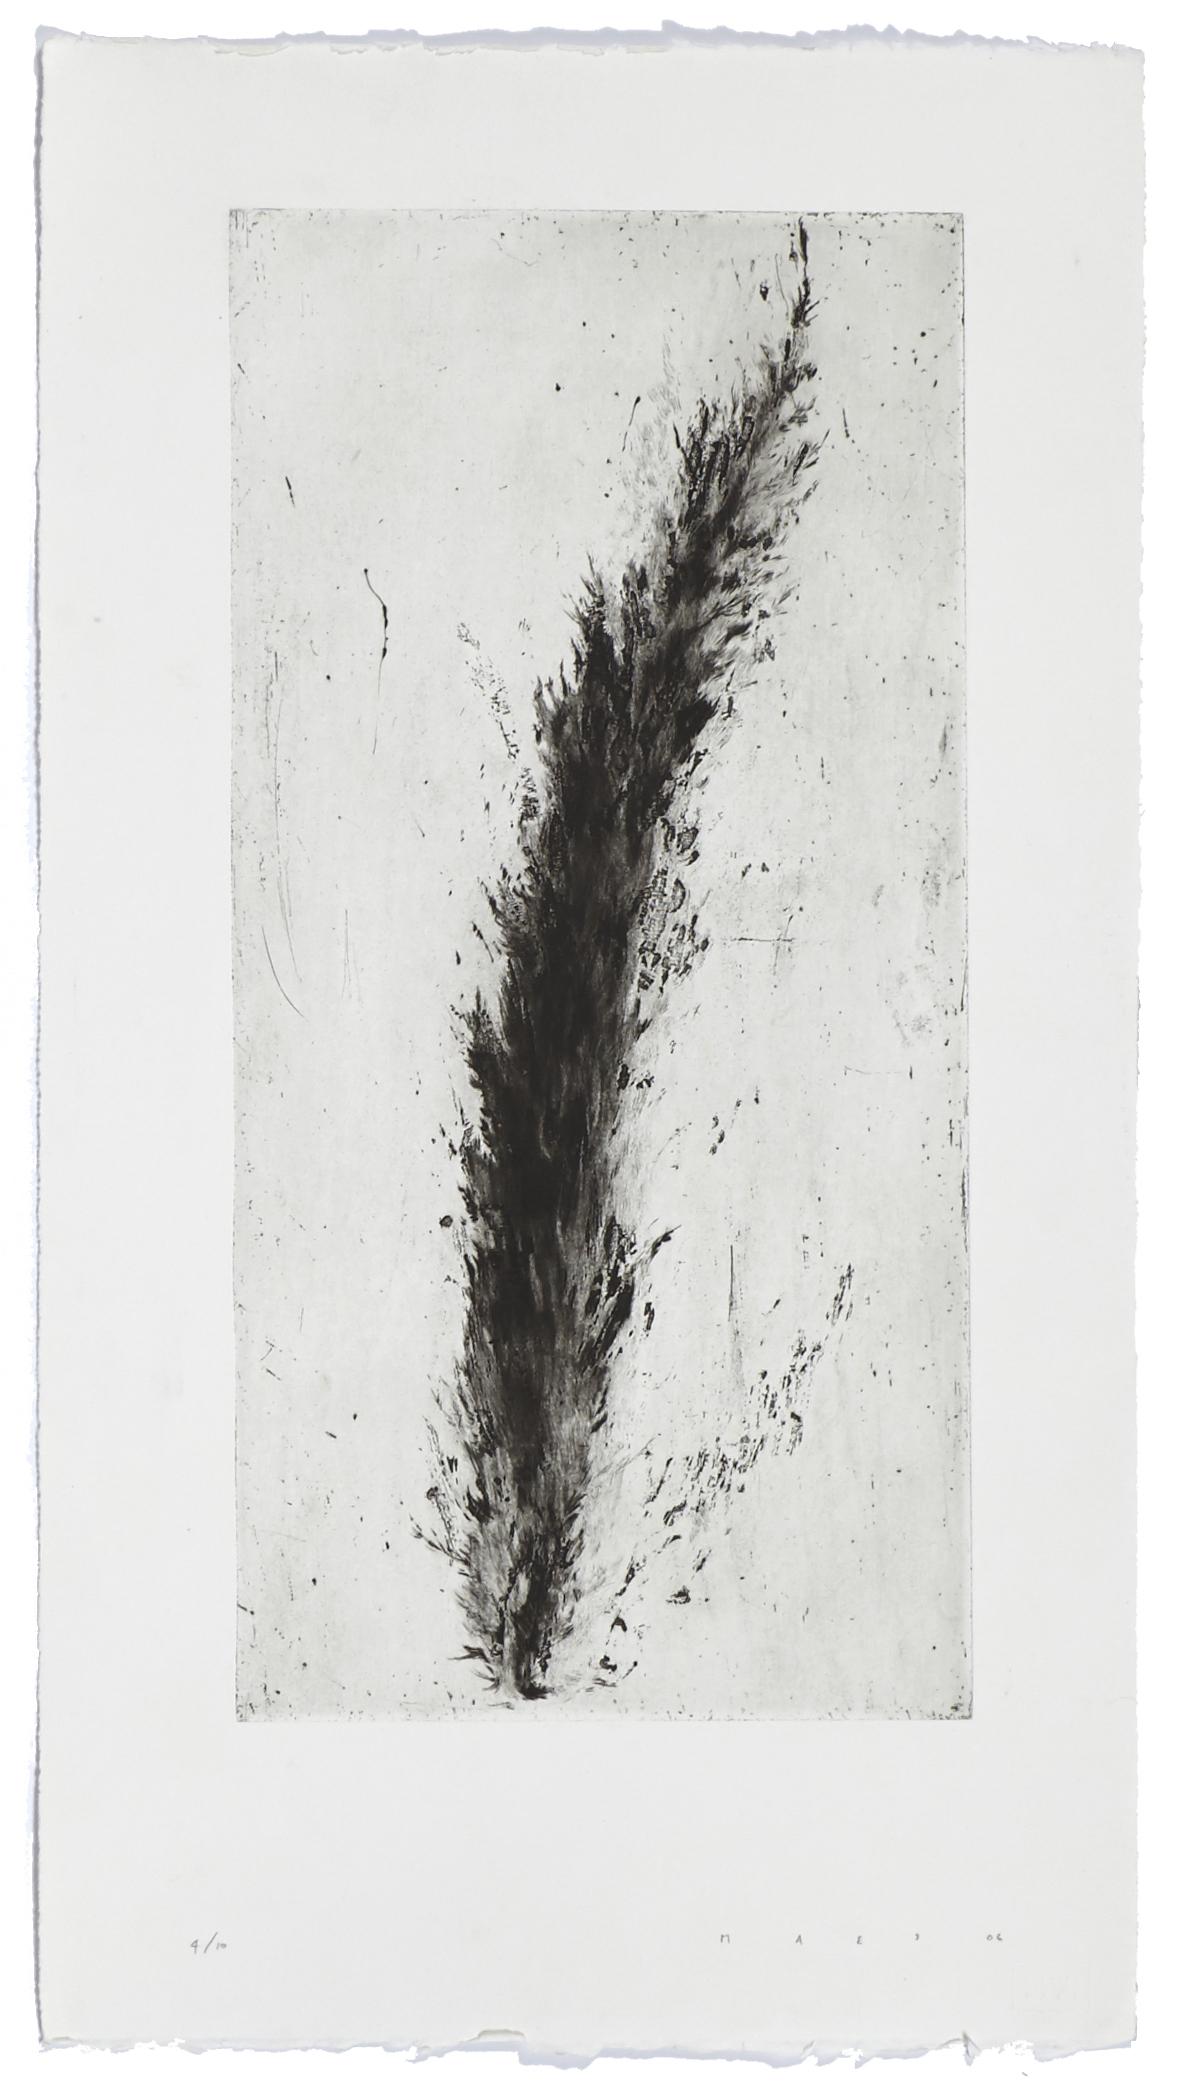 Cyprès    2006 | 66.5 x 37 cm | Dry point | 10 prints